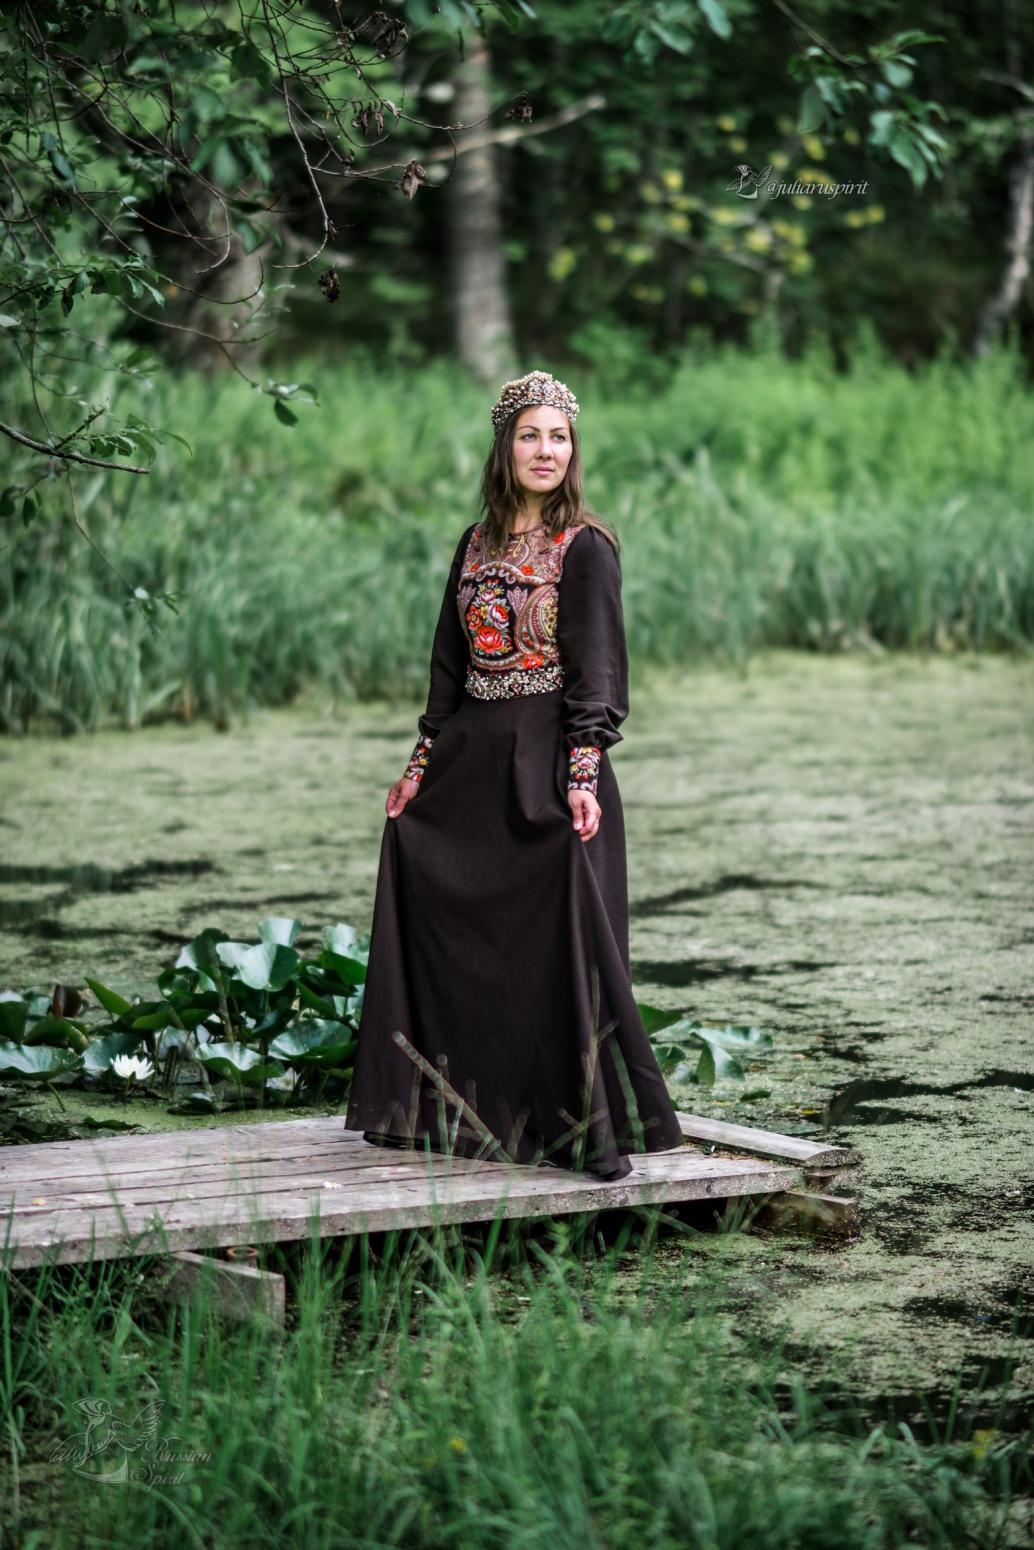 Девушка в костюме в русском стиле на мостике у пруда